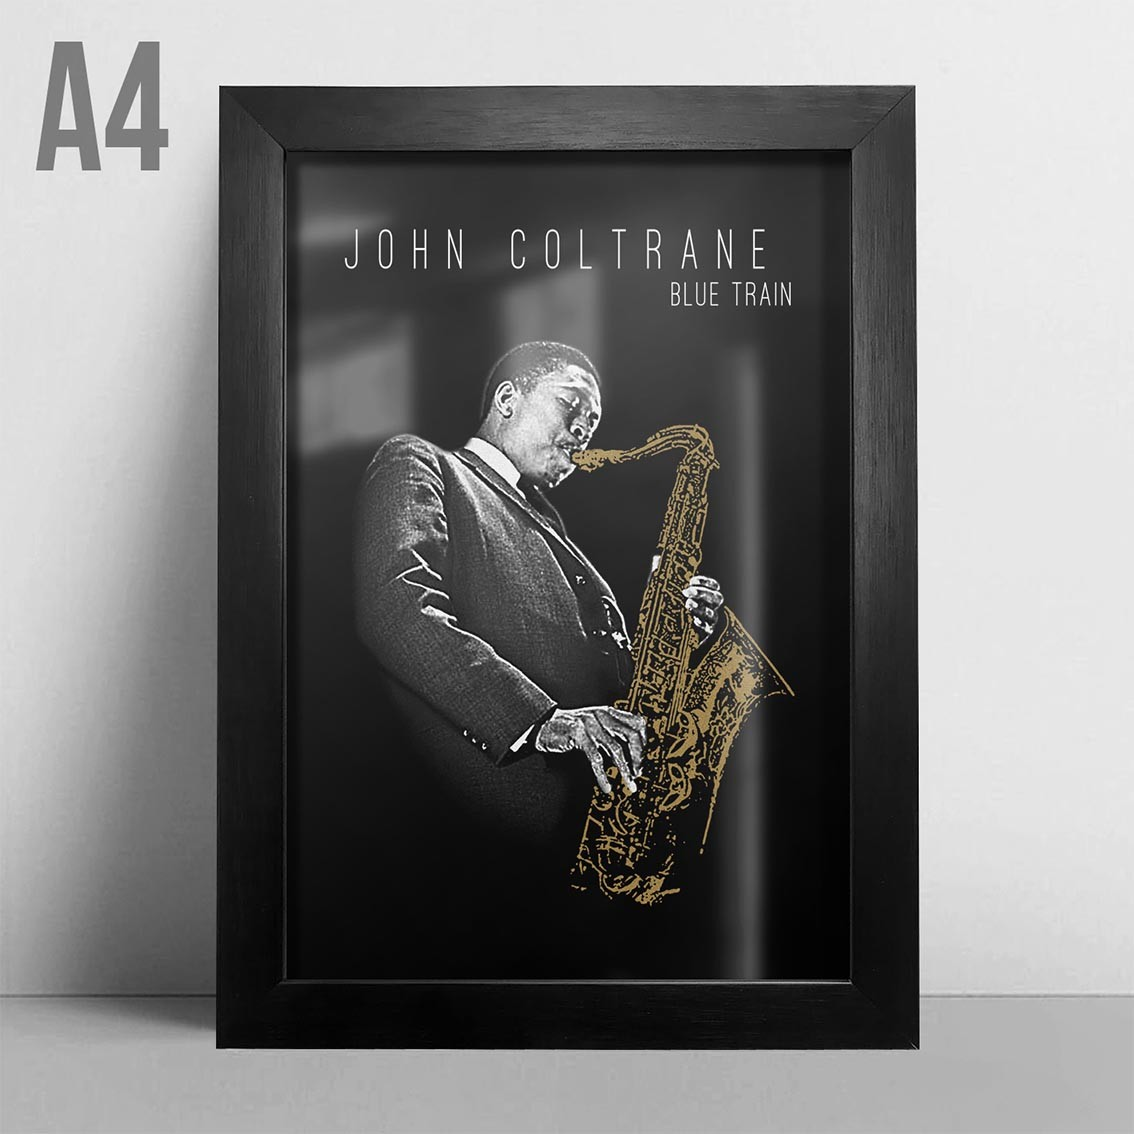 Quadro A4 - John Coltrane